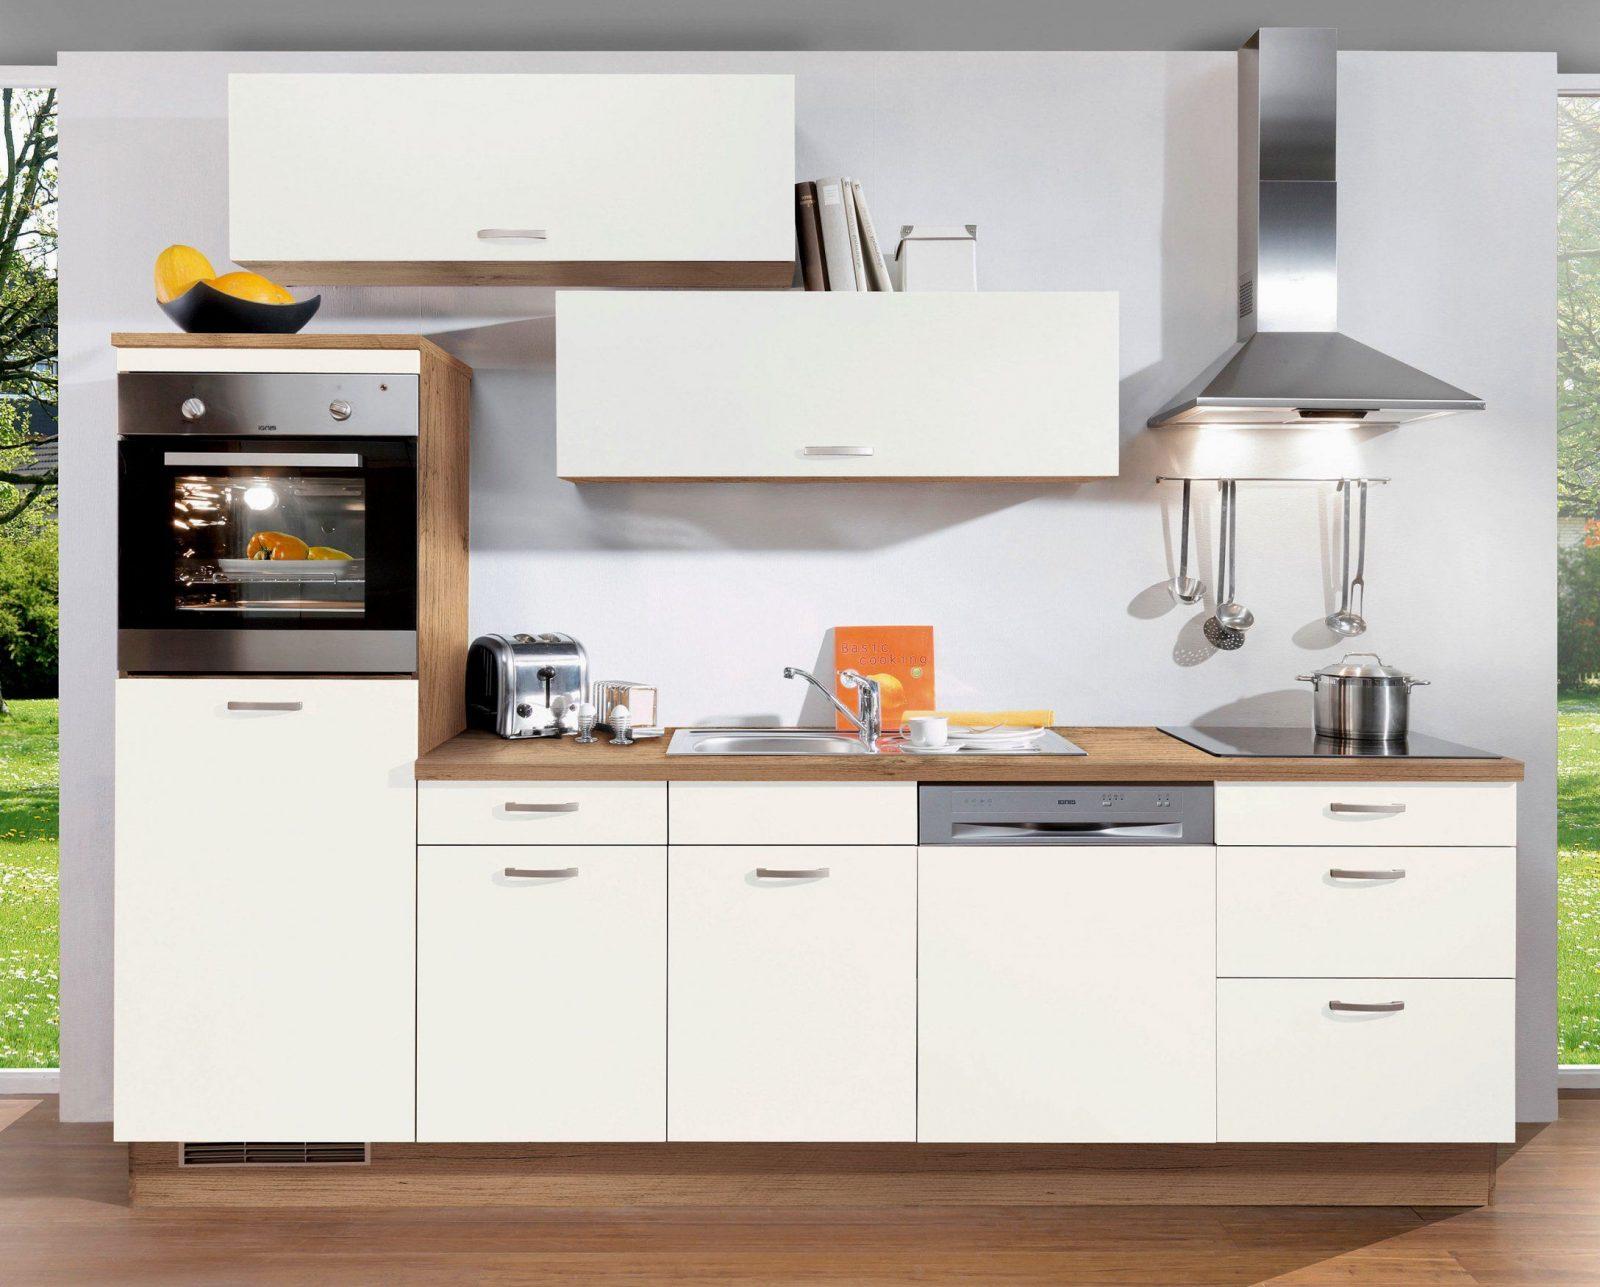 Komplett Ka C Bcchen Großartige Küchen Unter 1000 Euro Am Besten von Komplett Küchen Unter 1000 Euro Bild